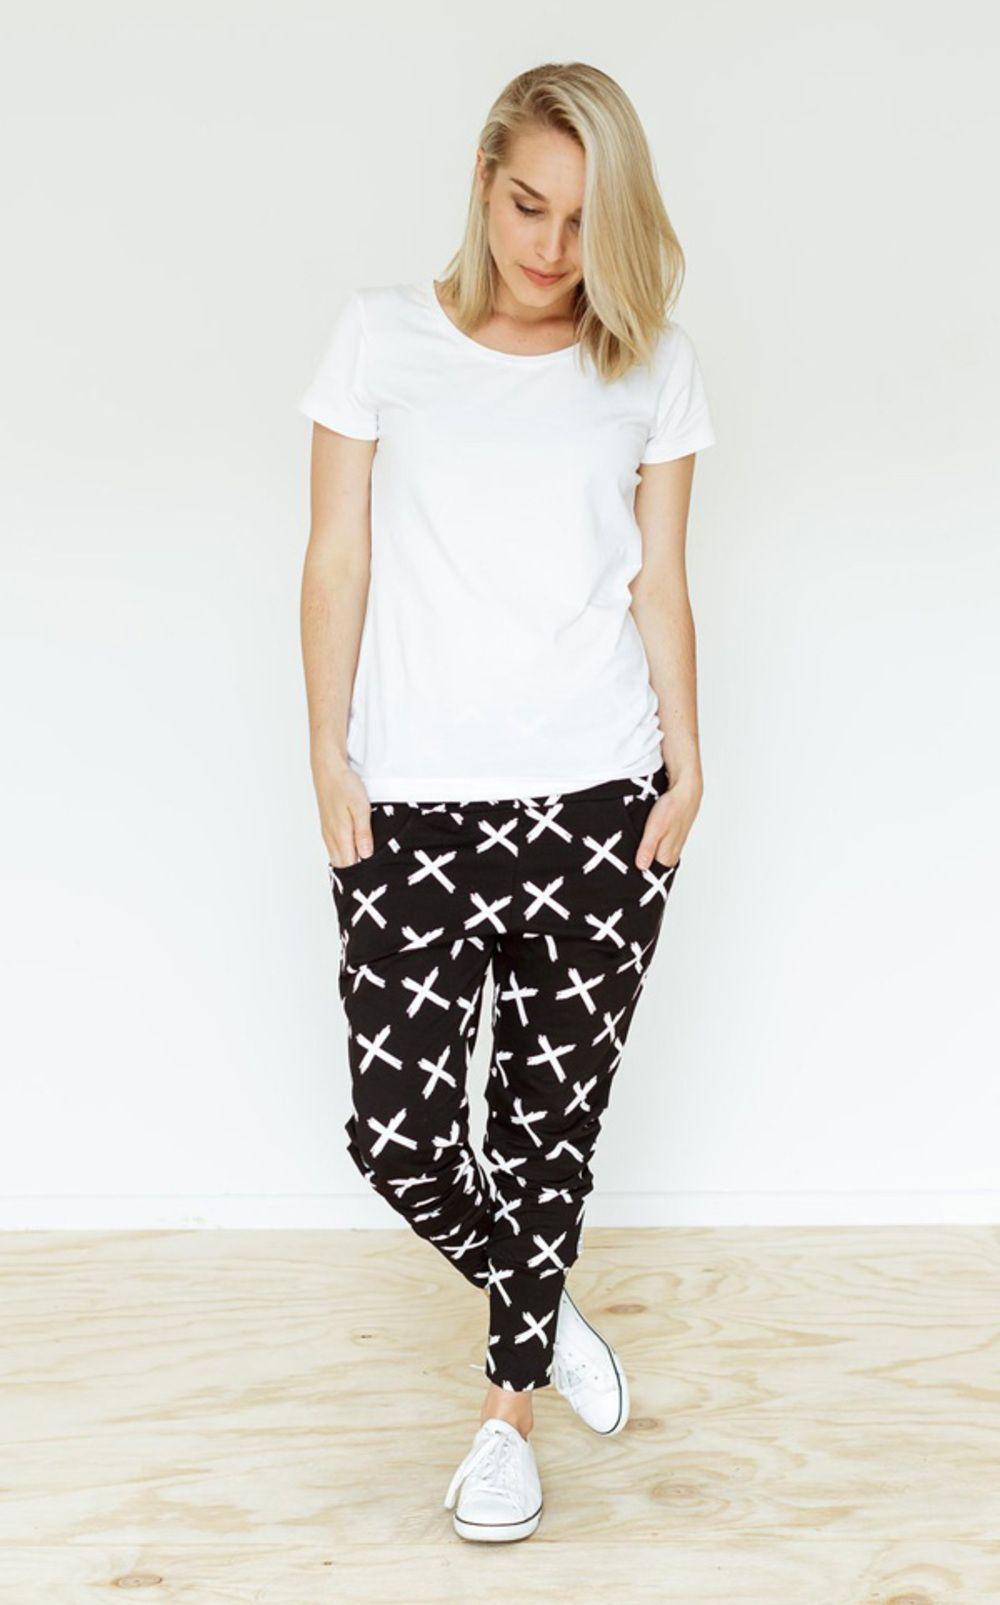 Home Lee Apartment Pants Black With Cross Print Nzfashion Dropcrotchpants